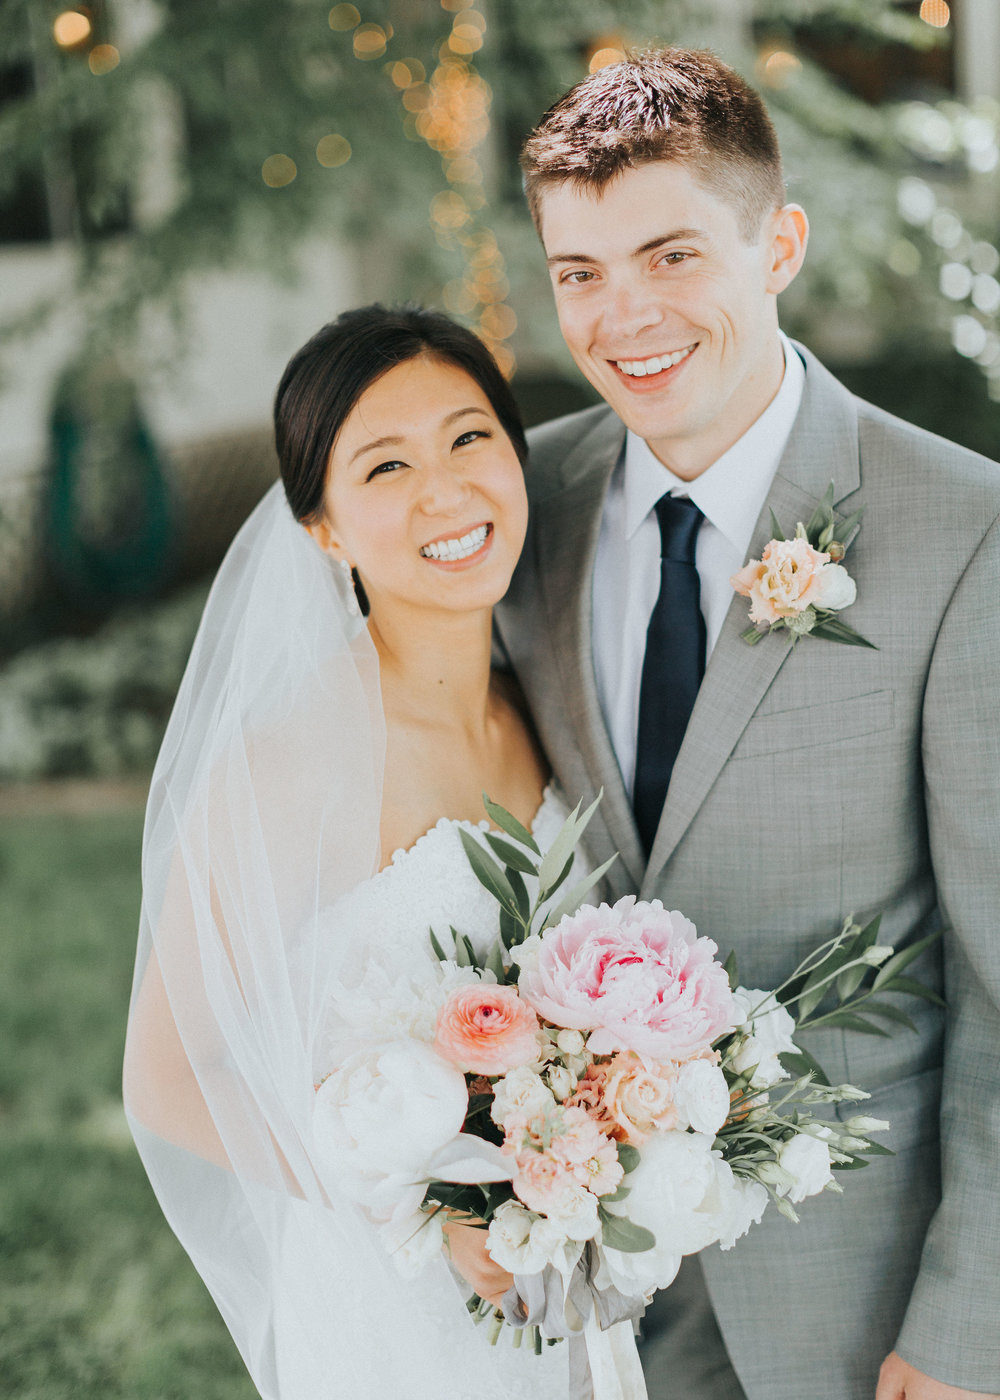 Melissa_Jason_Nonantum_Wedding_Portraits-052.jpg